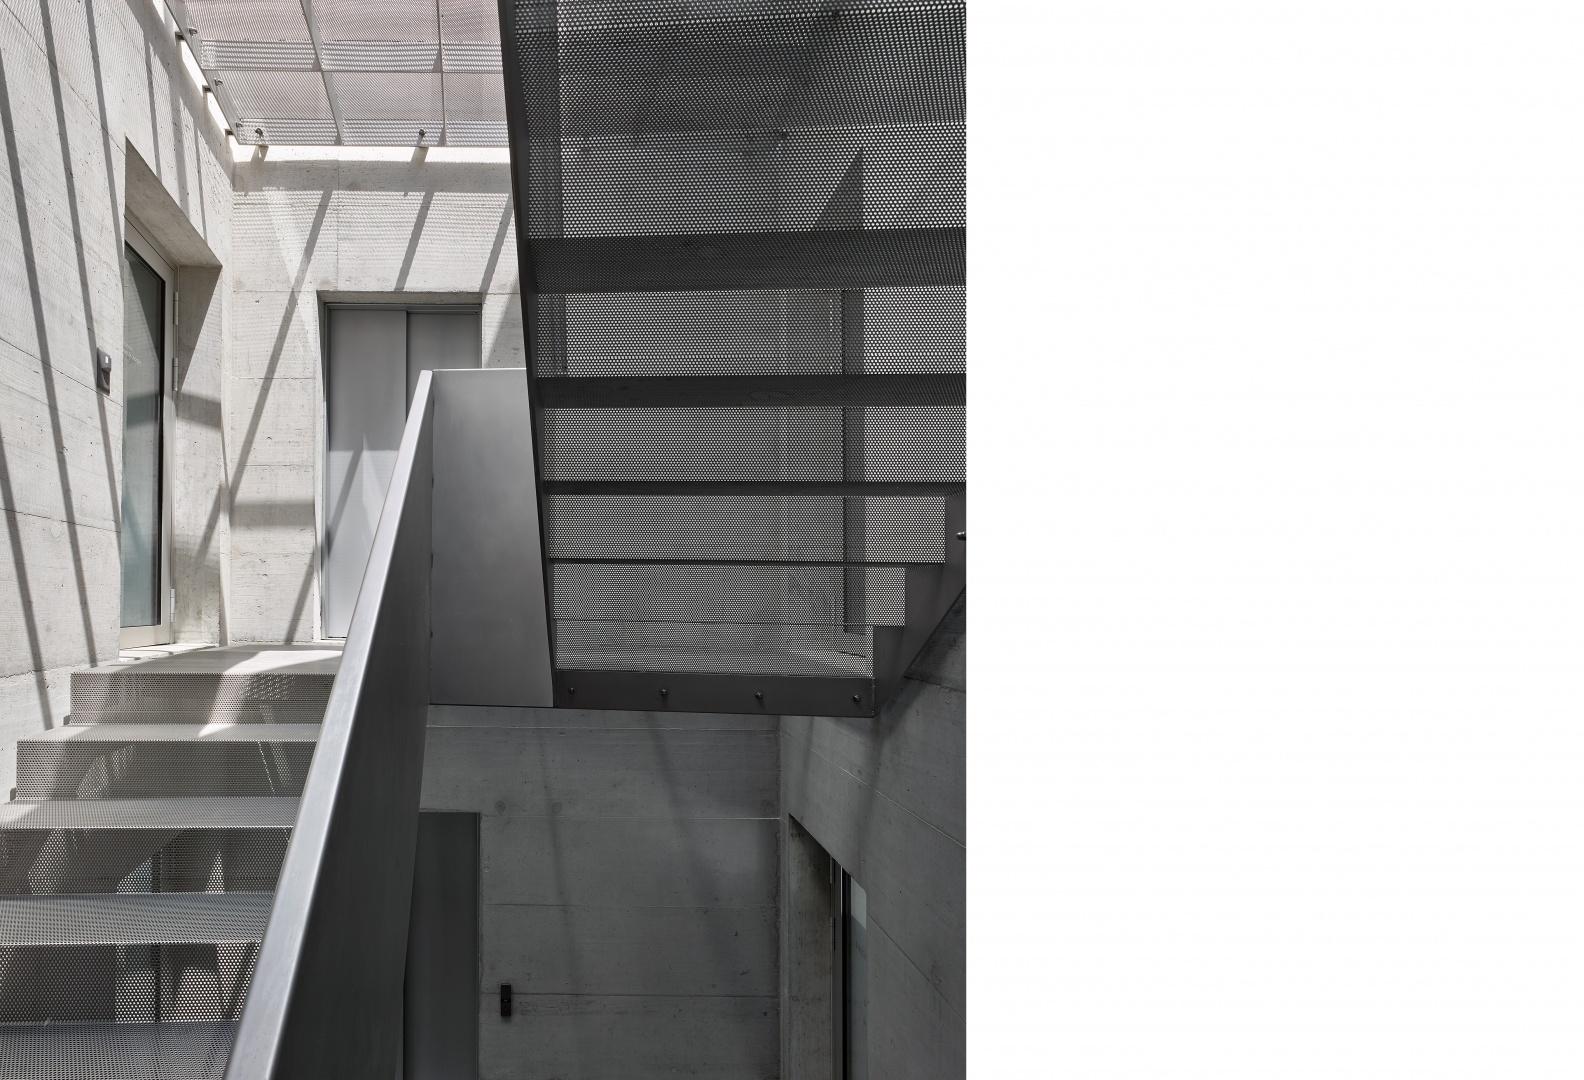 immeuble ronquos 35 escalier © thomas jantscher